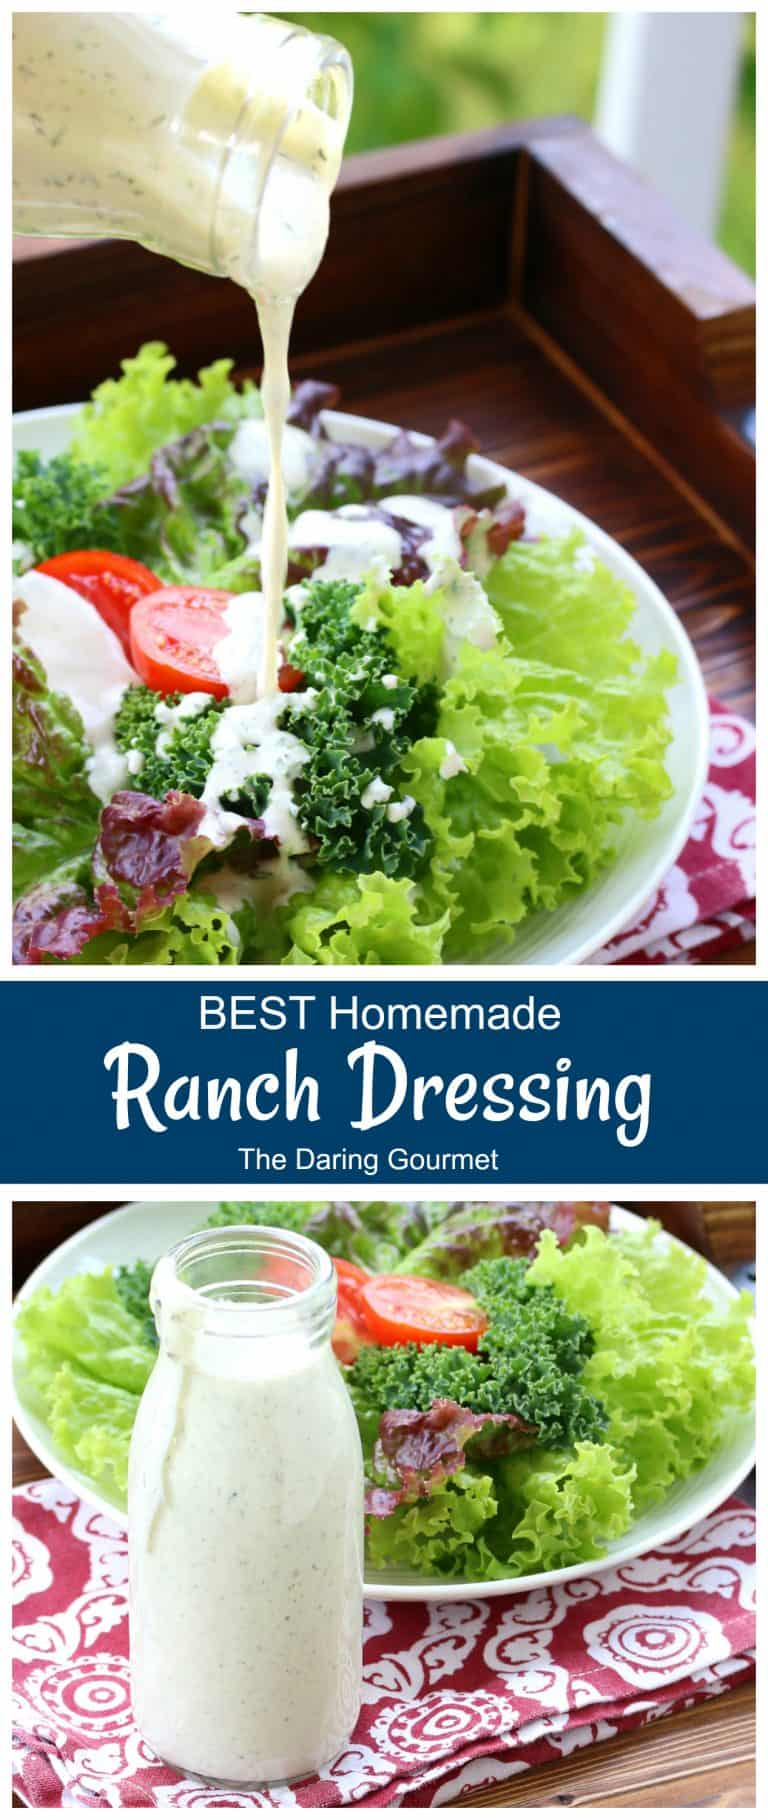 ranch dressing recipe homemade best